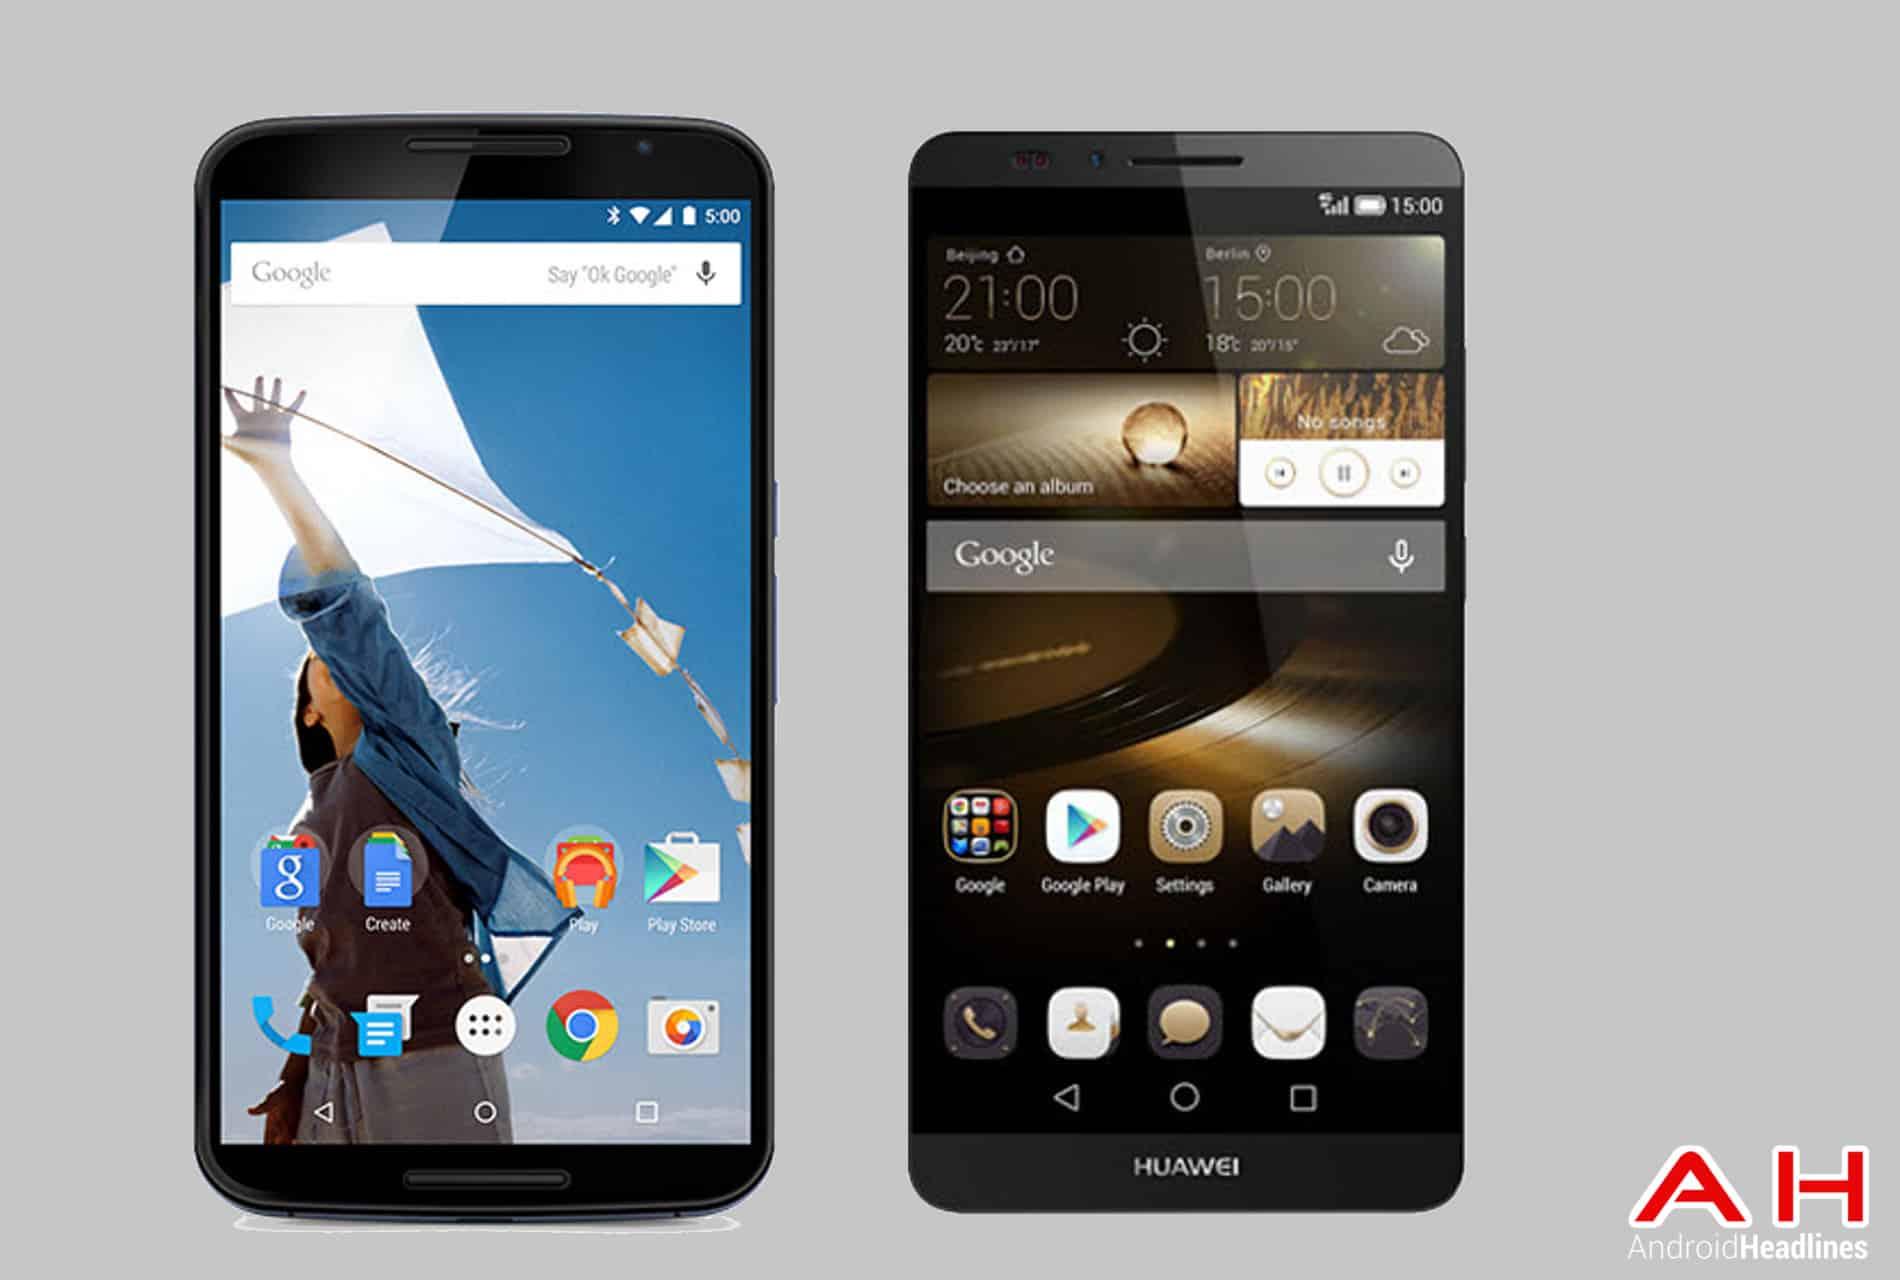 Nexus 6 vs Ascend Mate 7 cam AH